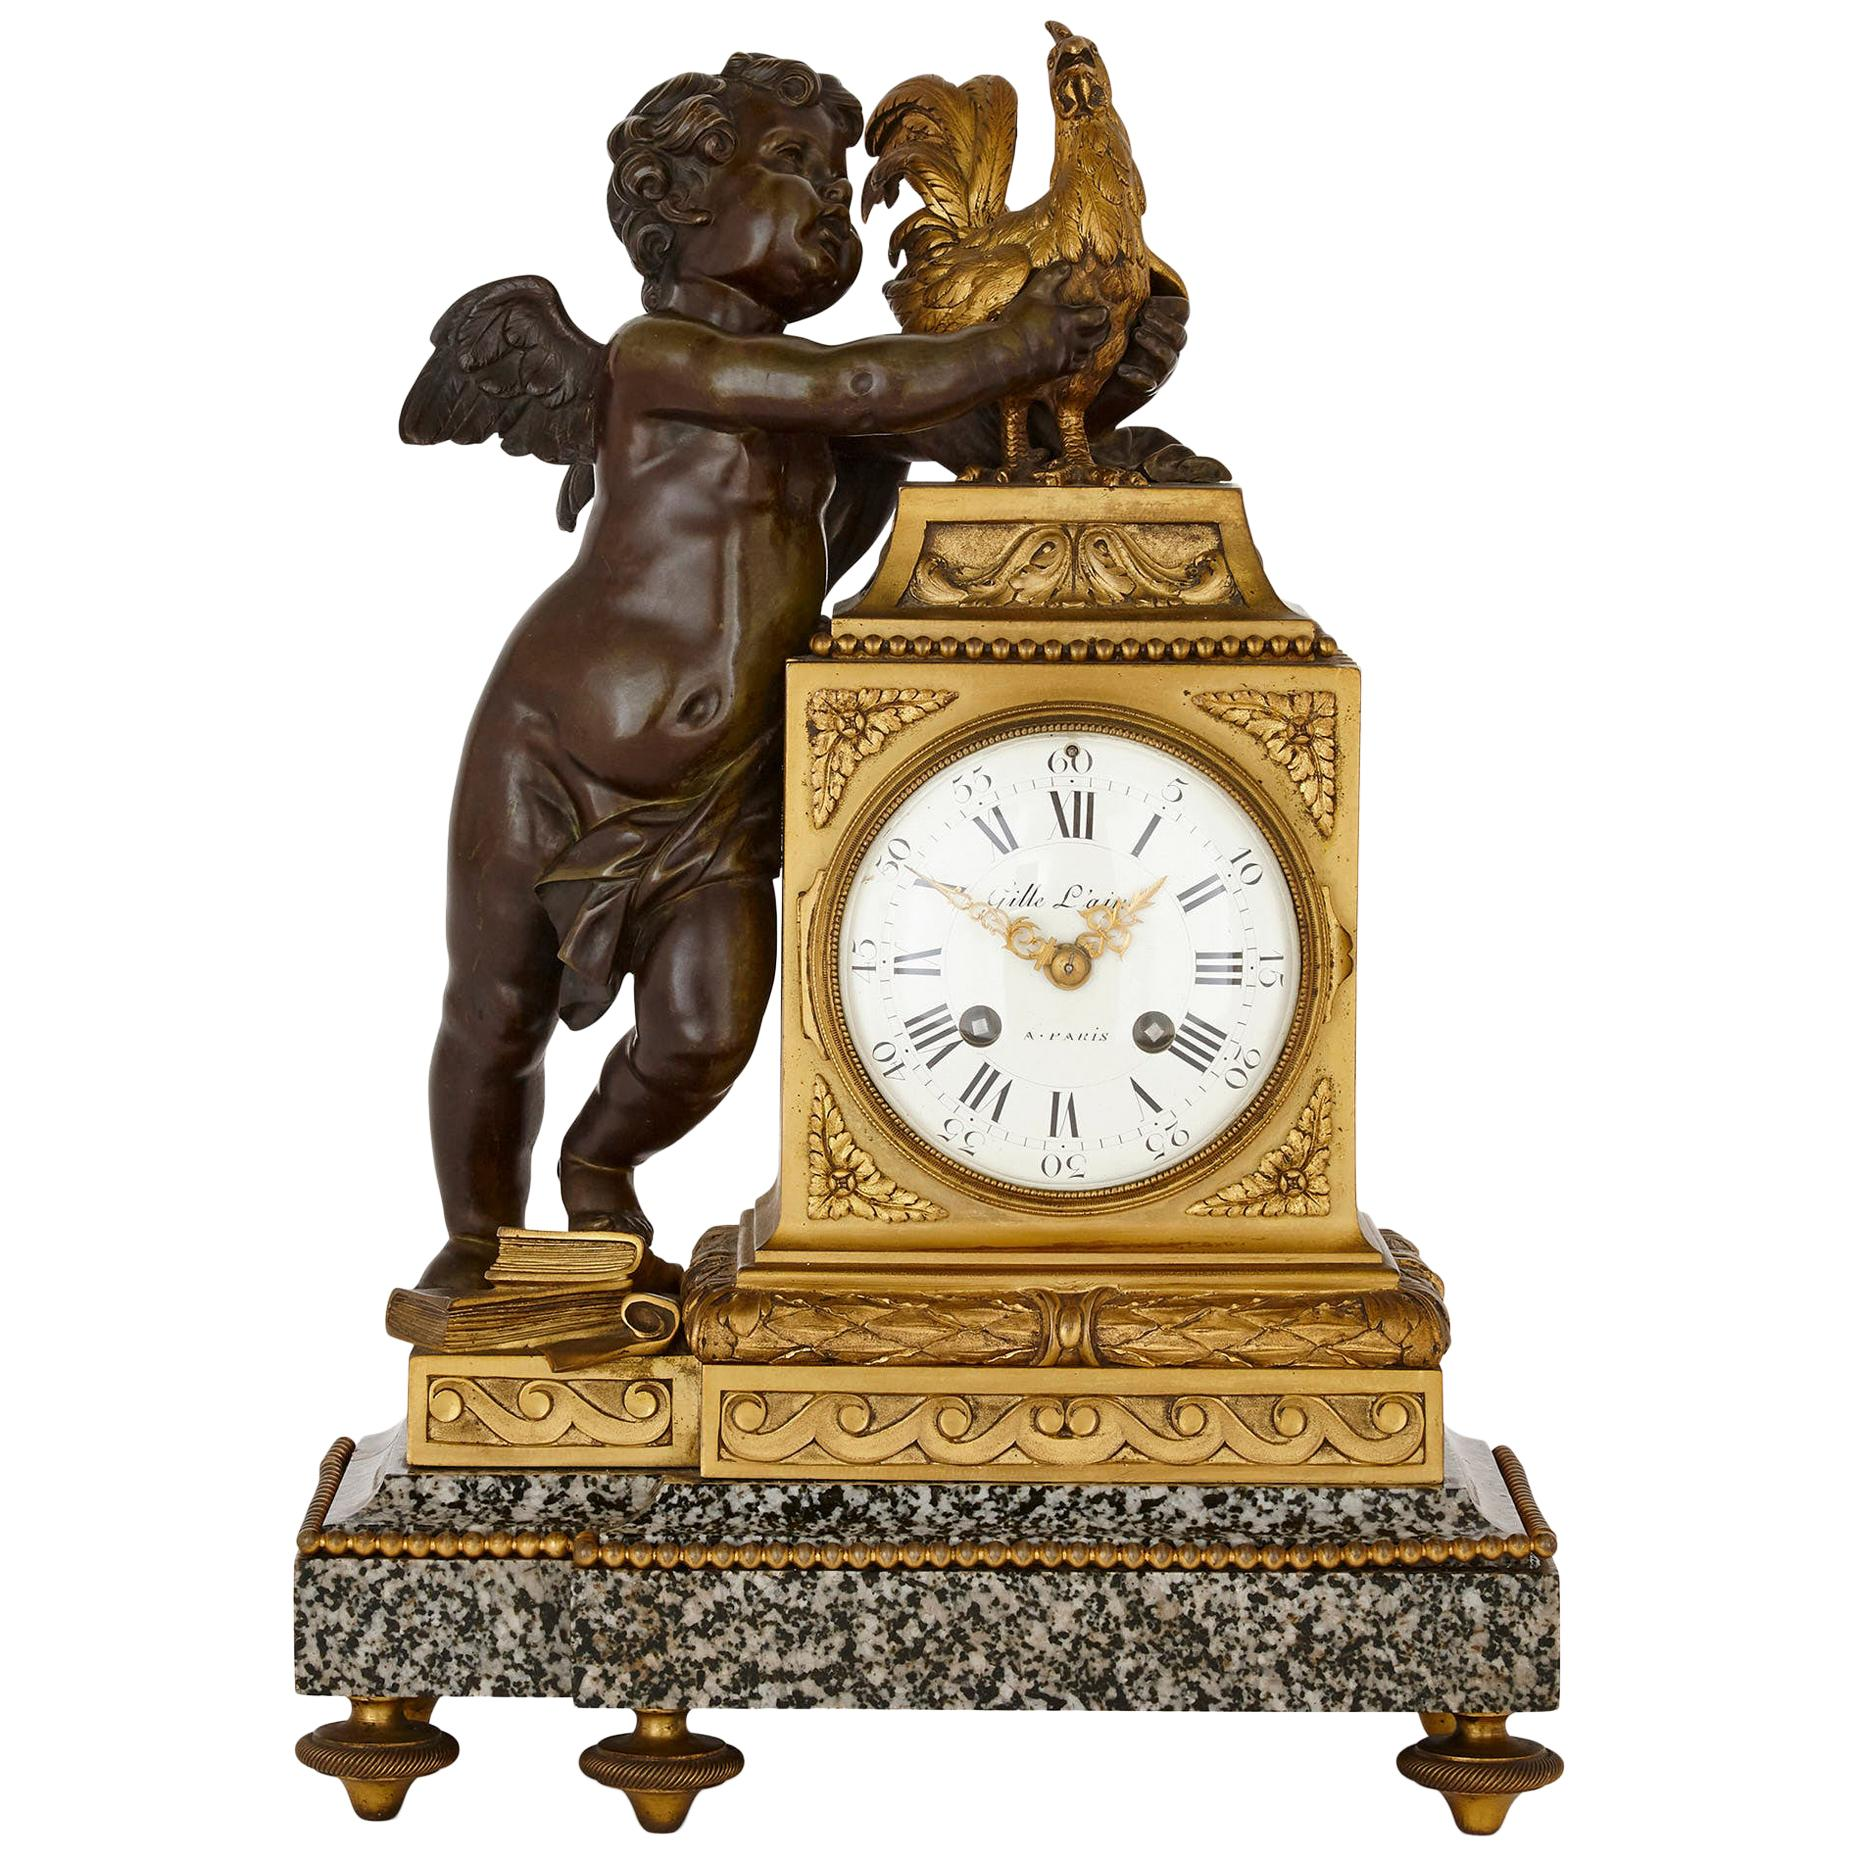 Louis XVI Style Ormolu and Marble Mantel Clock